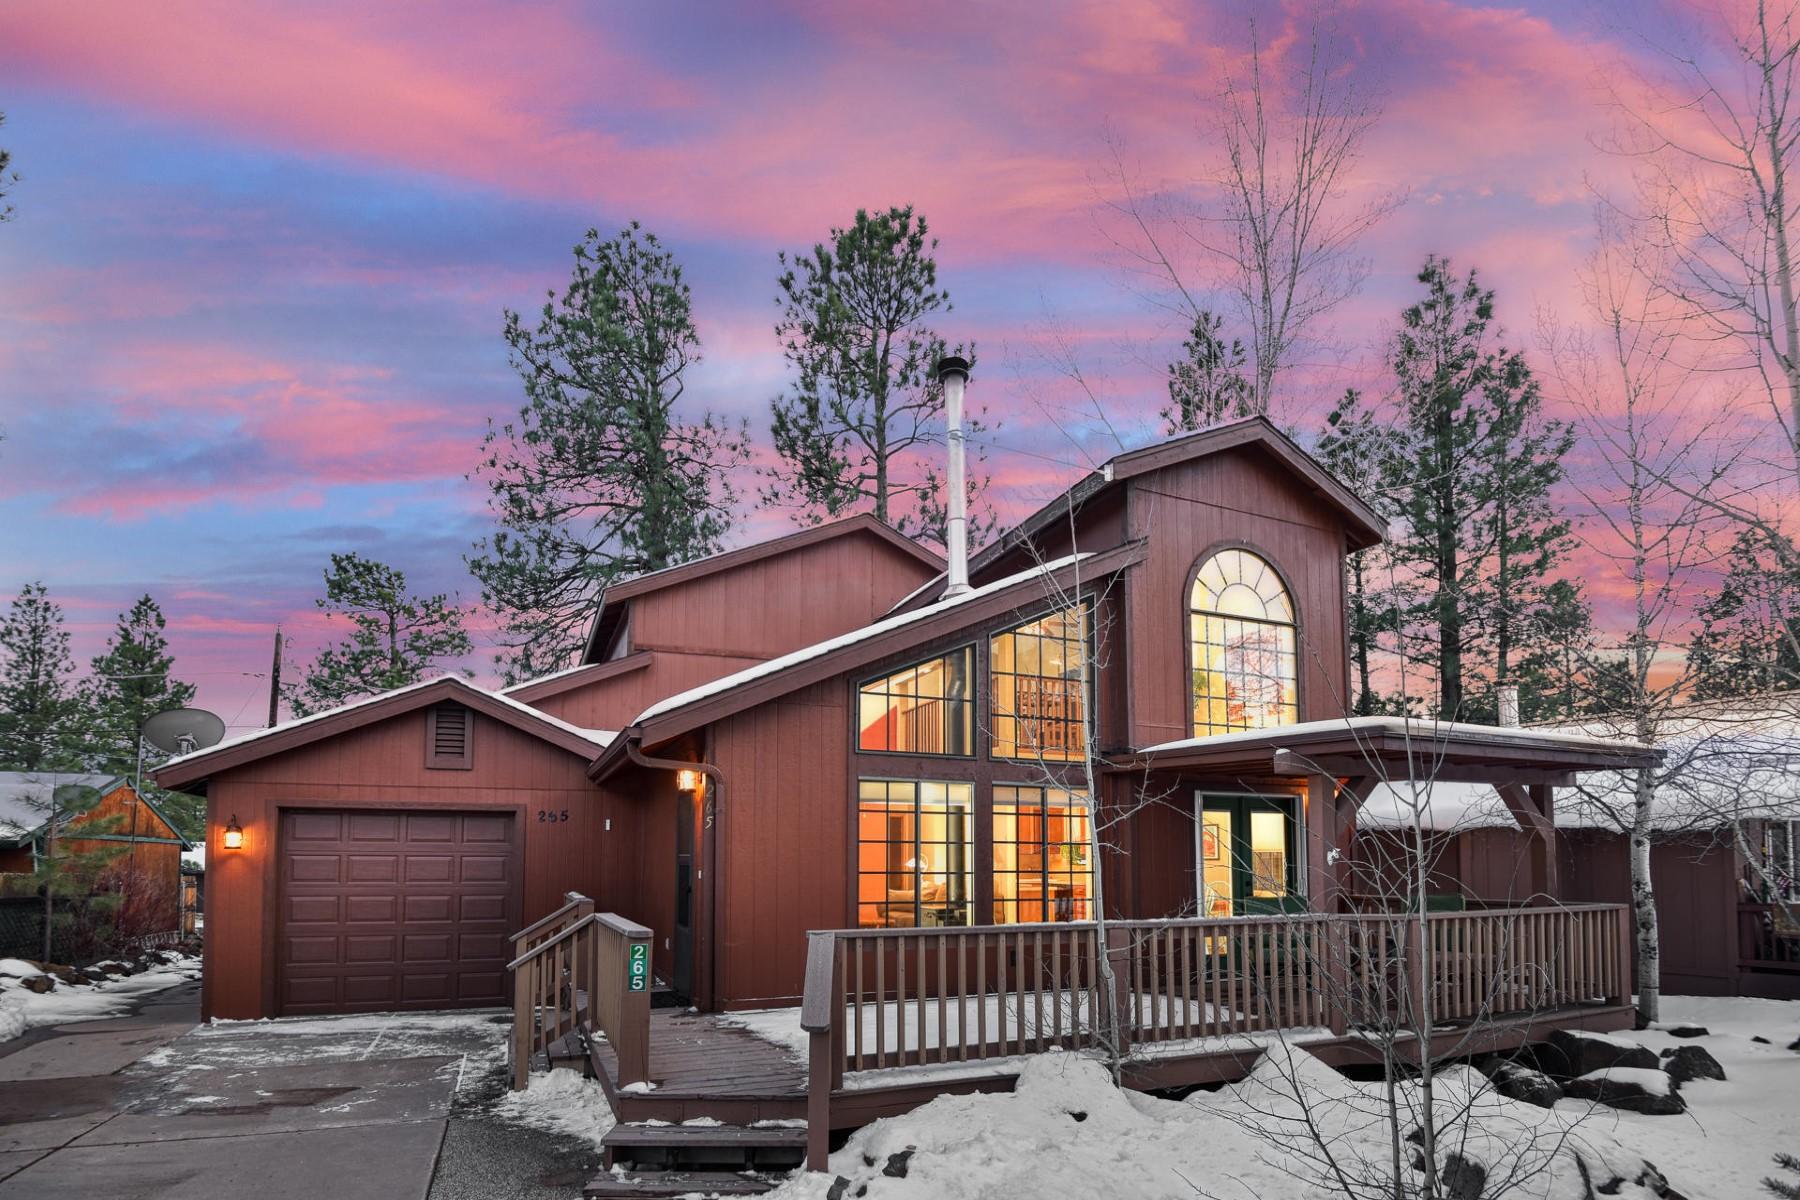 single family homes for Active at Remarkable Custom Munds Park Home 265 E HILLSIDE DR Munds Park, Arizona 86017 United States